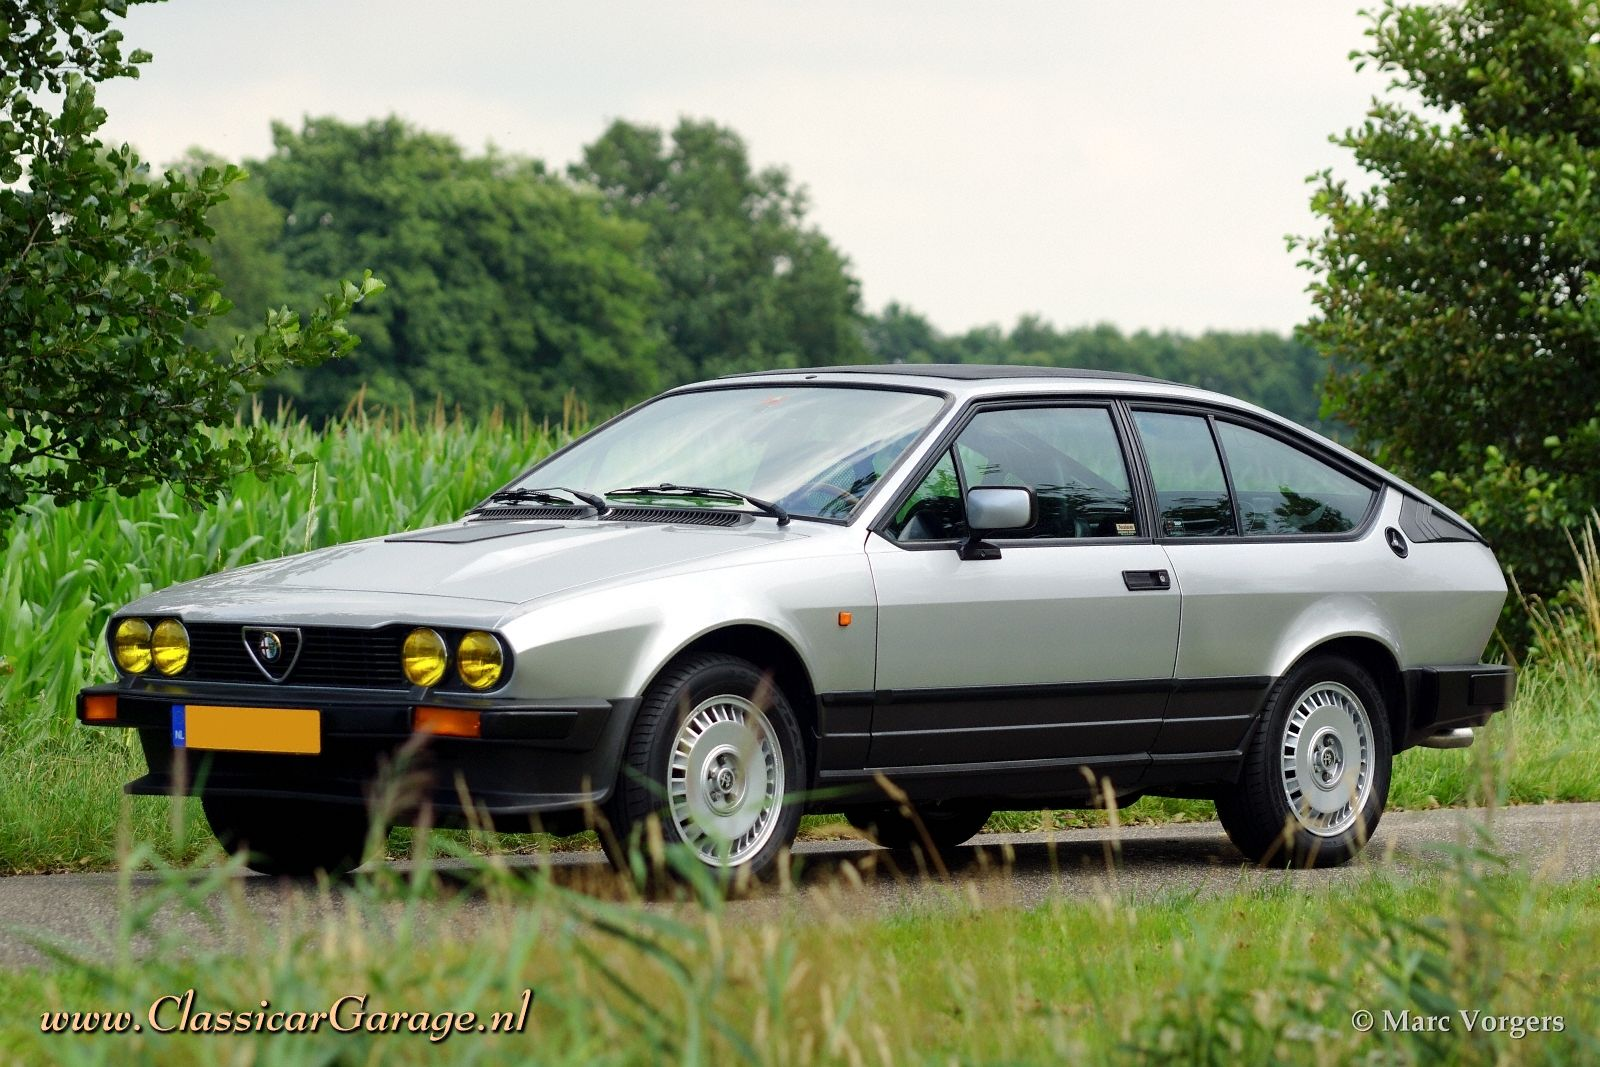 PontiacFiero as well Alfetta moreover T3135 Tutoriel Du Remplacement Des Flector De Transmission Sur Un Gtv6 Et Ou Chassis Transaxle as well Sale also 1567 Alfetta. on what a alfa gtv6